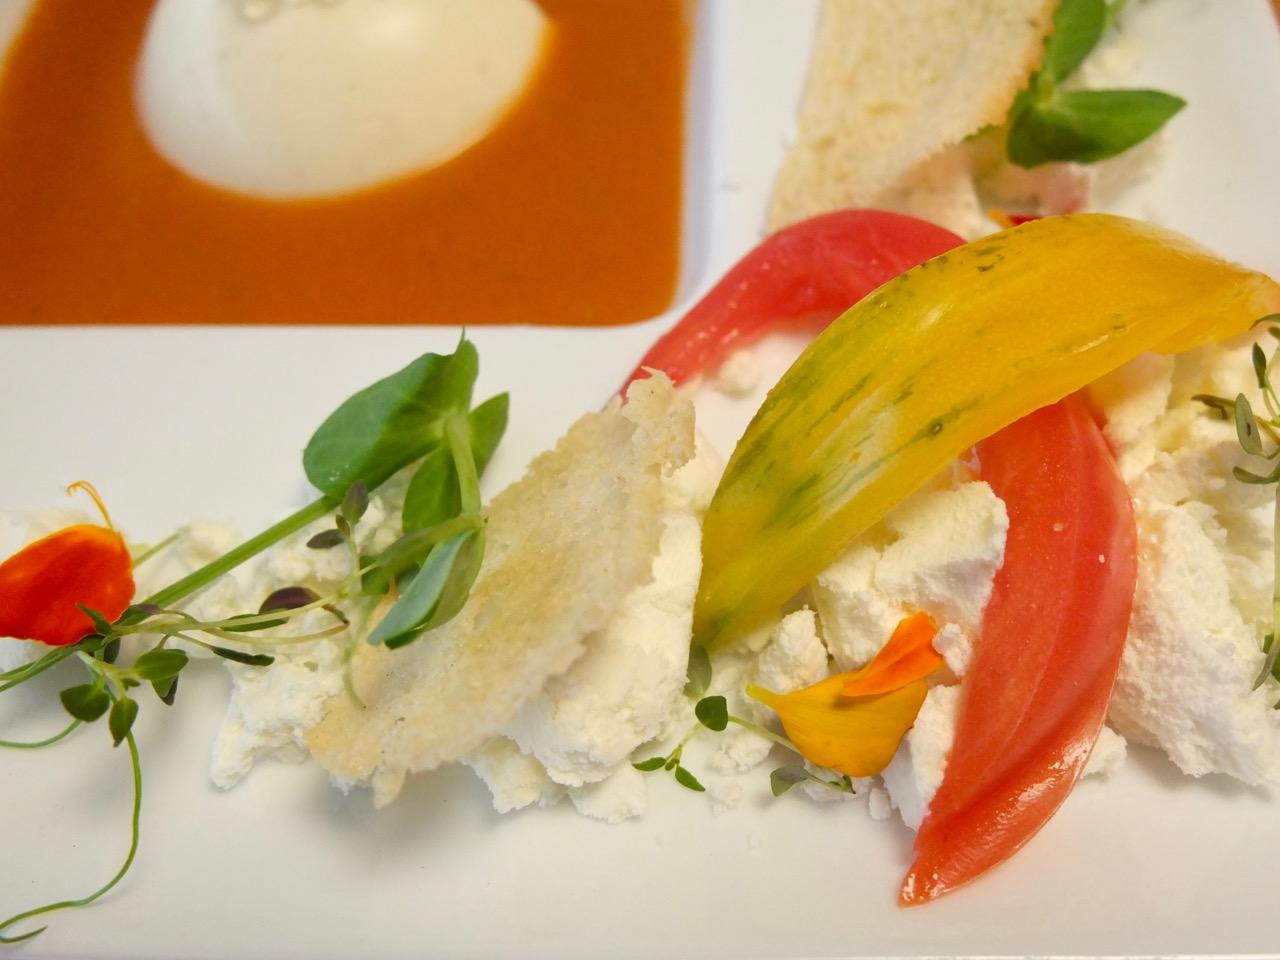 Vegetarian Appetizer: Heirloom Tomato Gazpacho